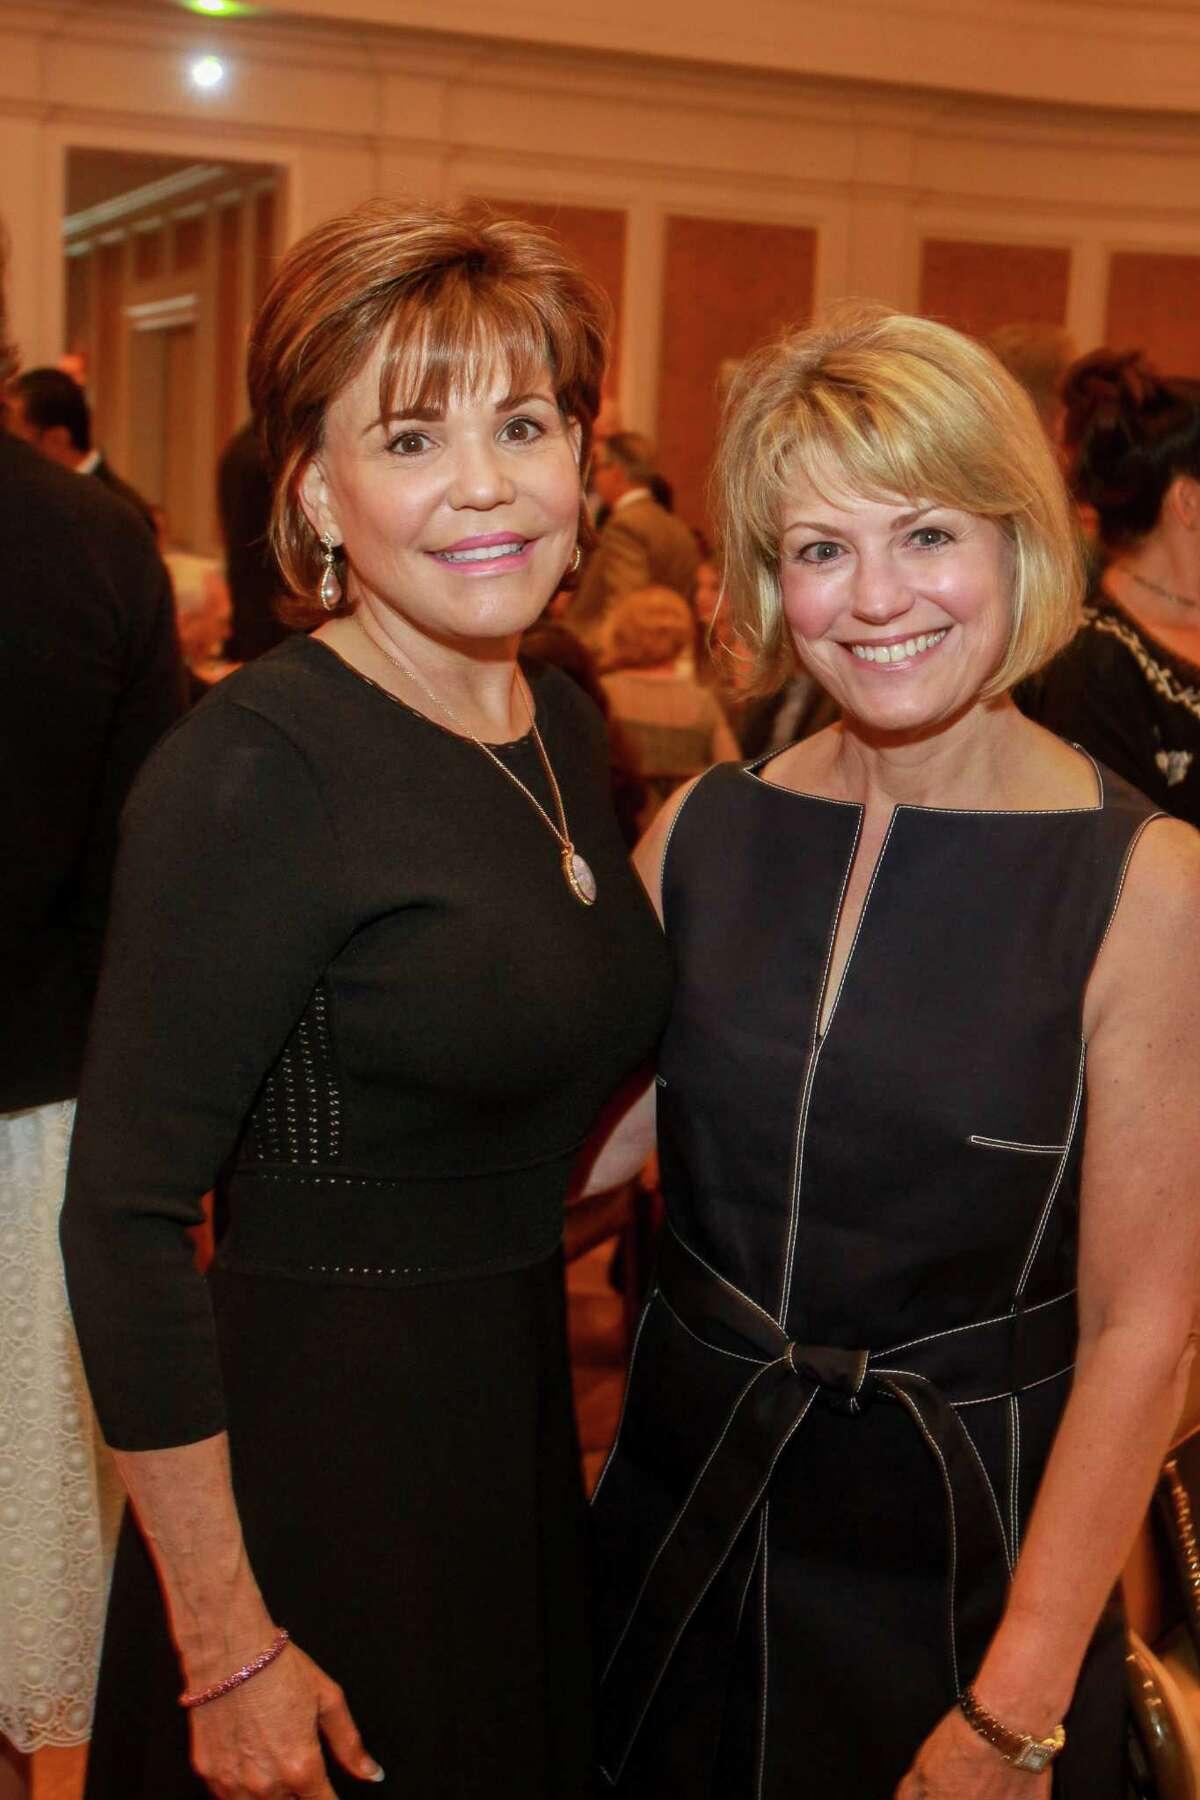 Hallie Vanderhider, left, and Kelley Lubanko at the Houston Center for Literacy 2017 Mayor's Literacy Leadership Award Breakfast. (For the Chronicle/Gary Fountain, June 1, 2017)